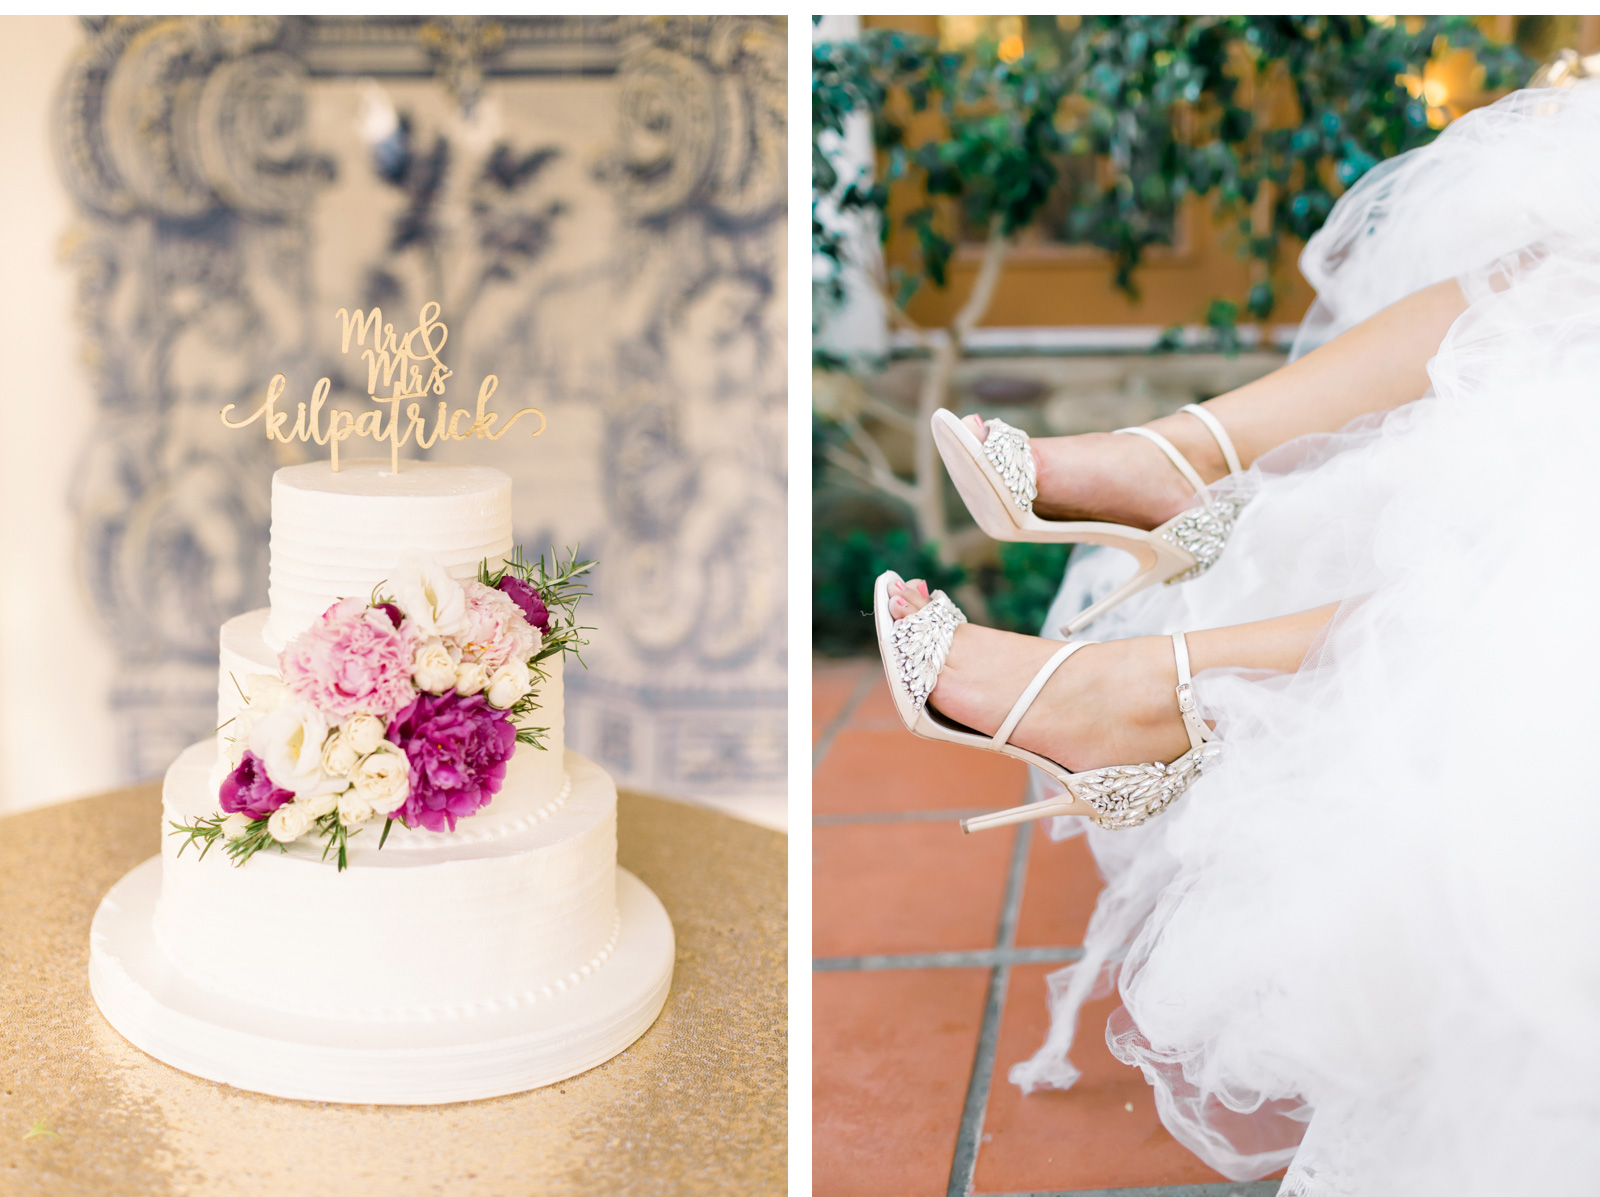 Kestrel-Park-Wedding-Natalie-Schutt-Photography_08.jpg